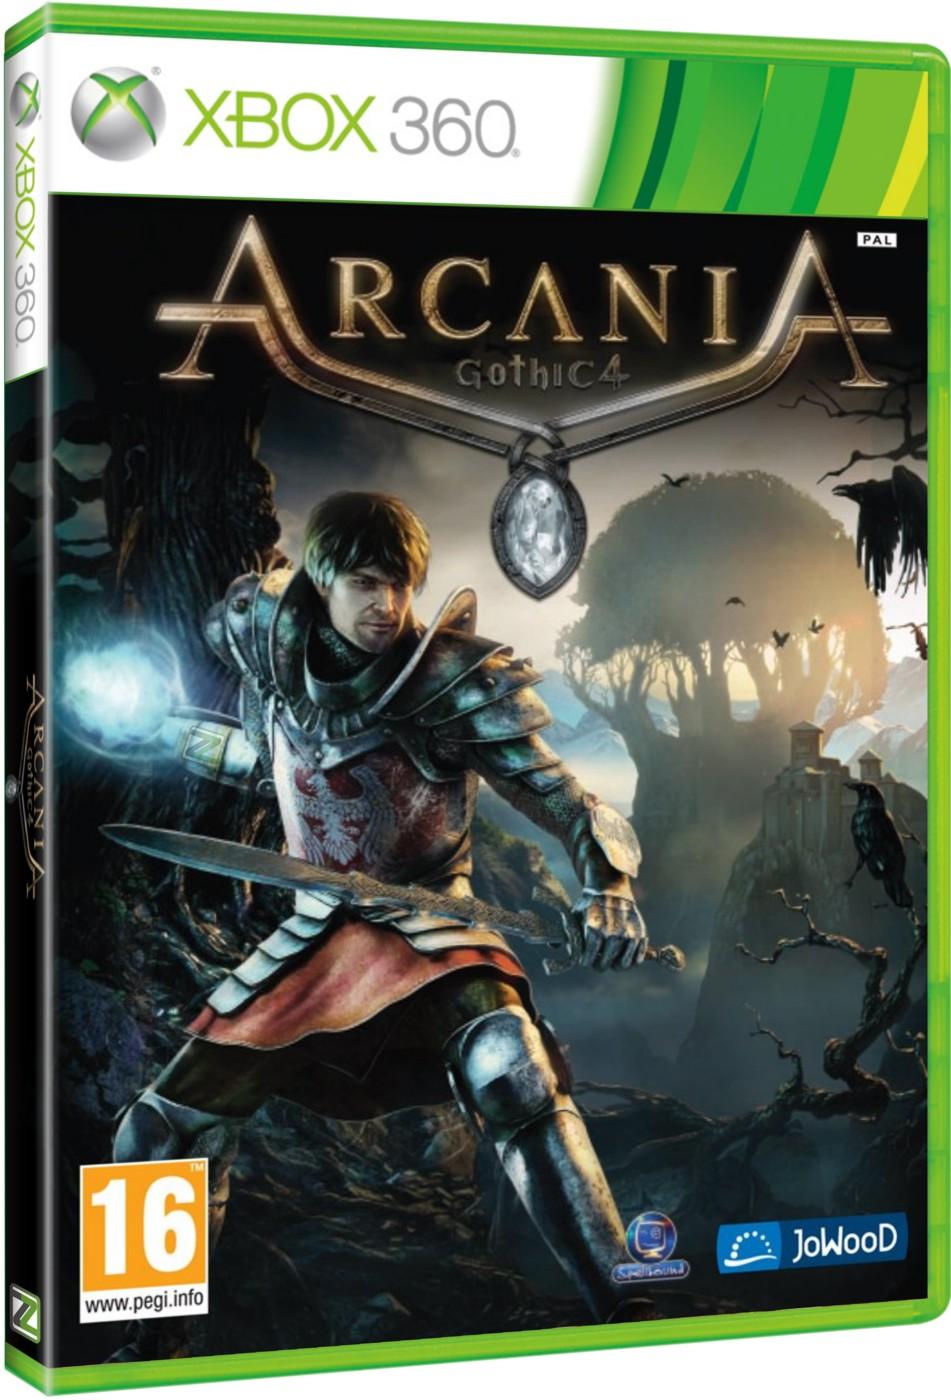 Arcania: Gothic 4 - X360